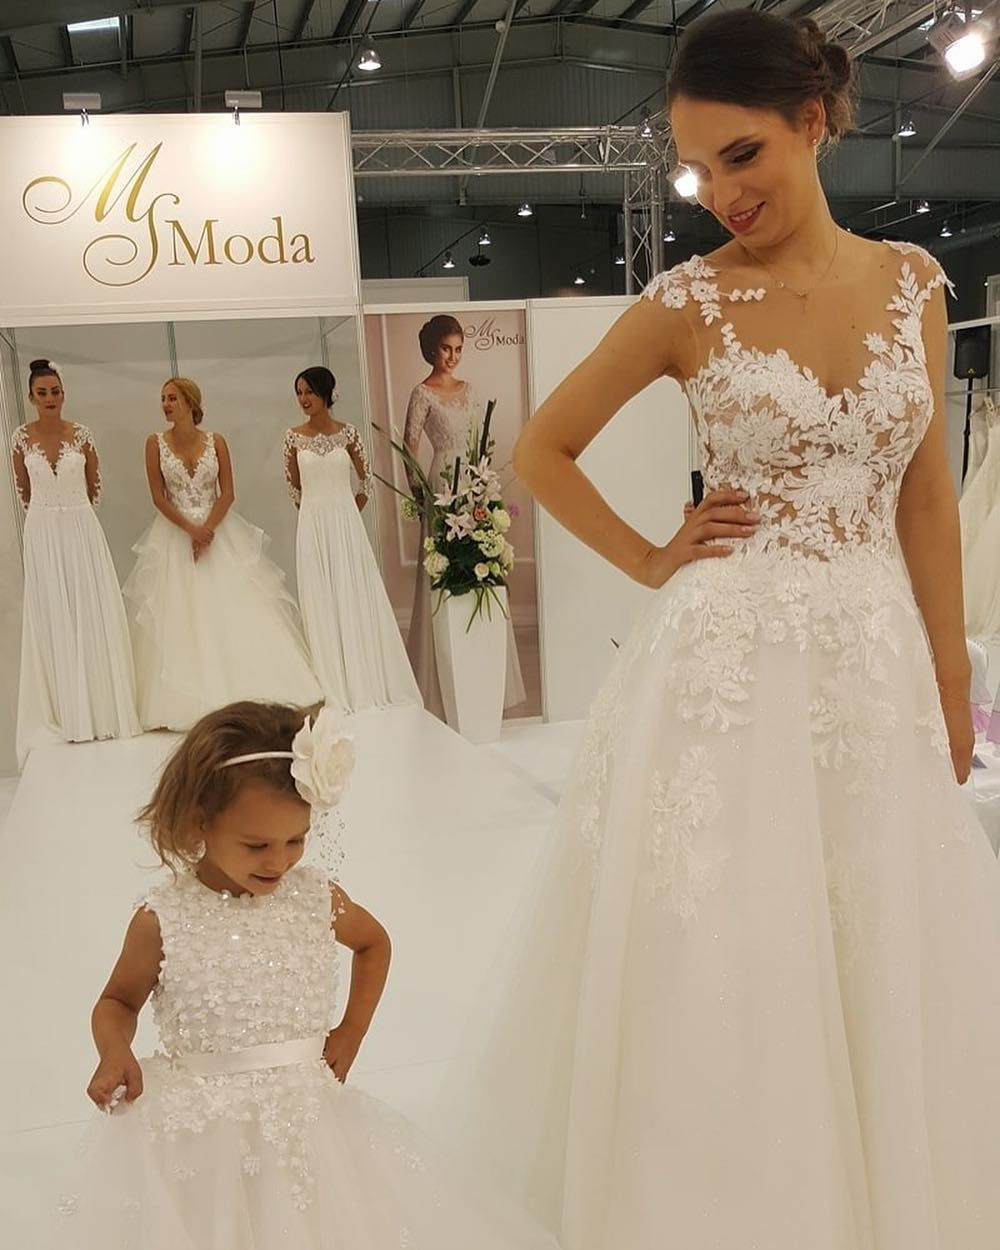 Polubienia 54 Komentarze 1 Ms Moda Bride At Msmodabride Na